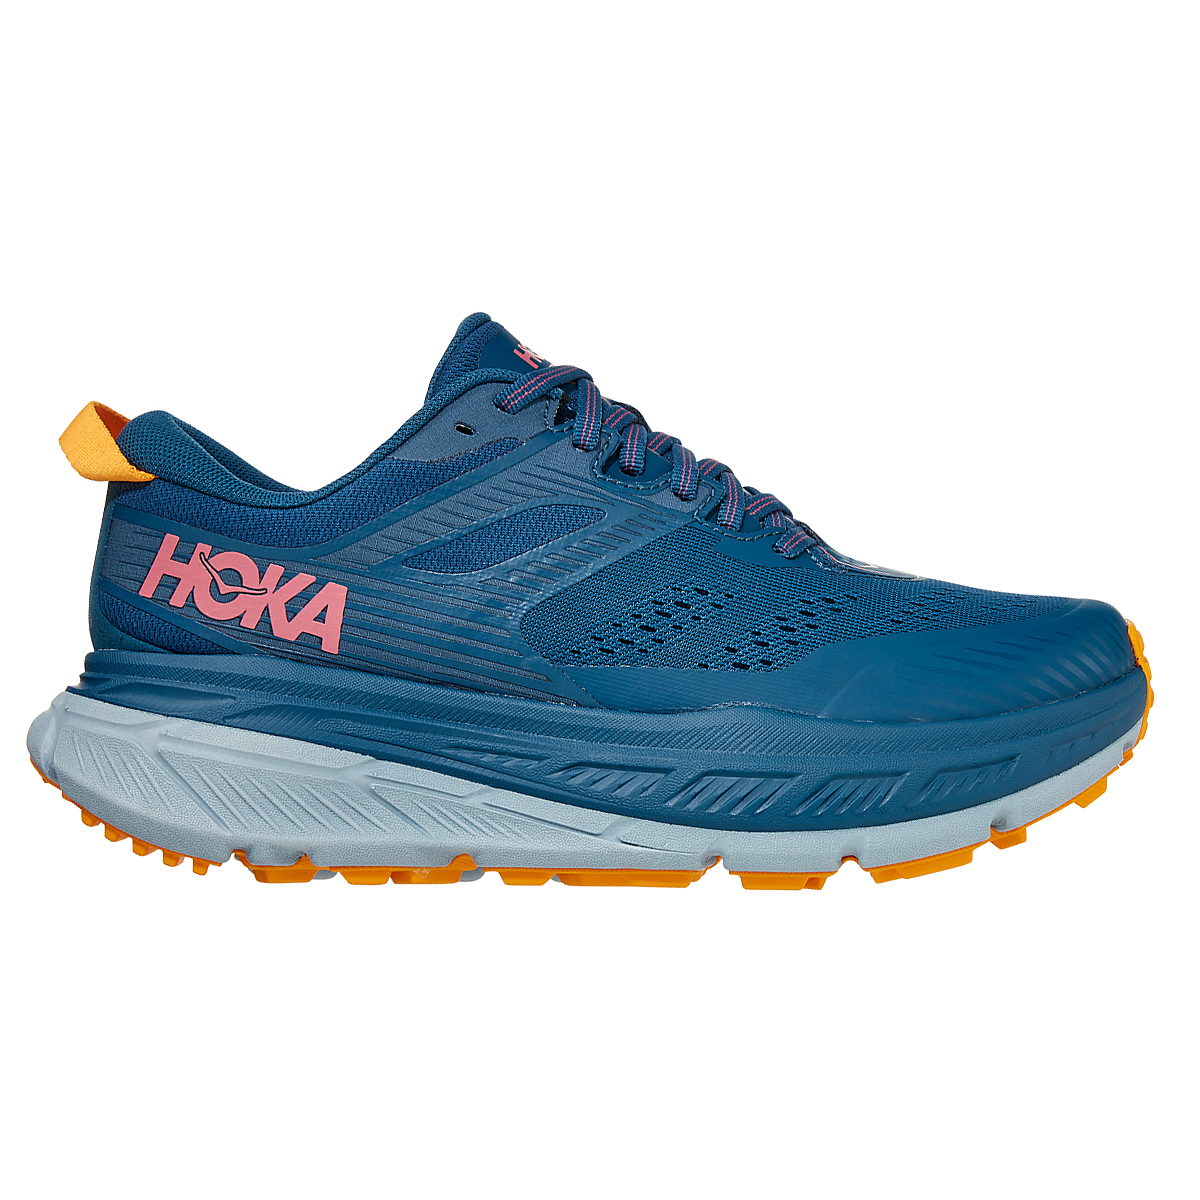 Women's Hoka One One Stinson ATR 6 Trail Running Shoe - Color: Moroccan Blue/Saffron - Size: 5 - Width: Regular, Moroccan Blue/Saffron, large, image 1